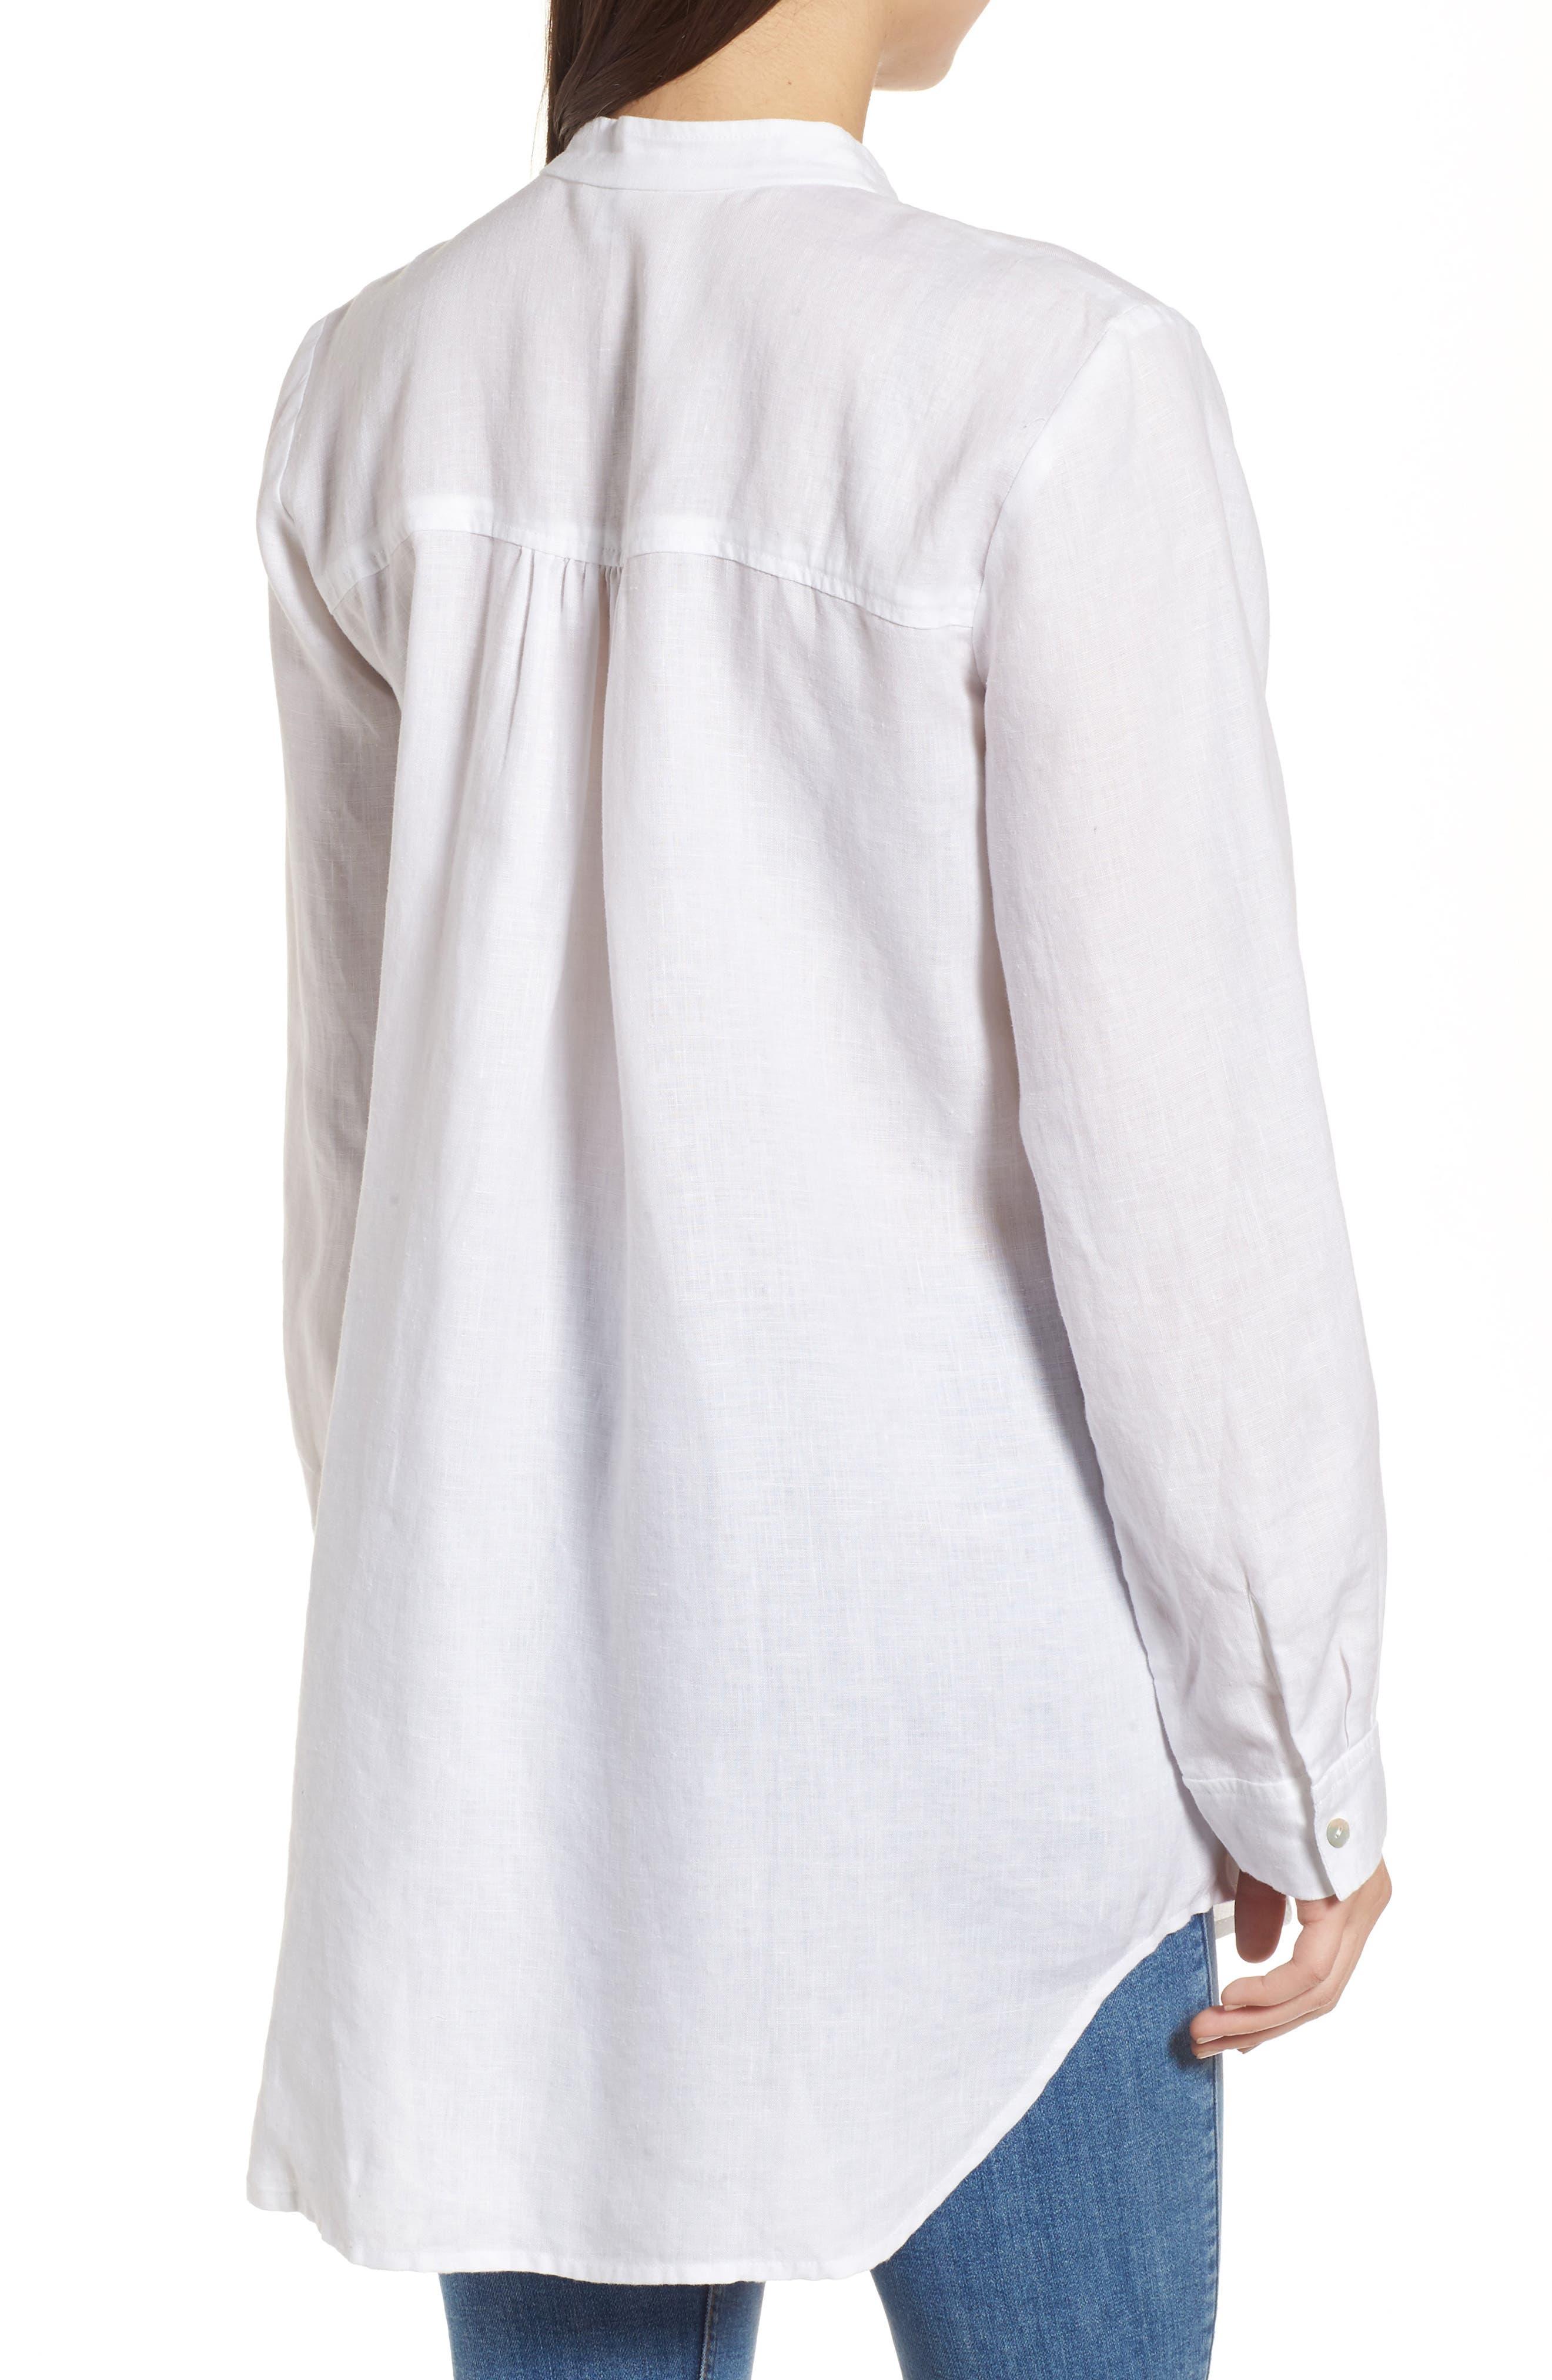 Organic Linen Tunic Shirt,                             Alternate thumbnail 2, color,                             100